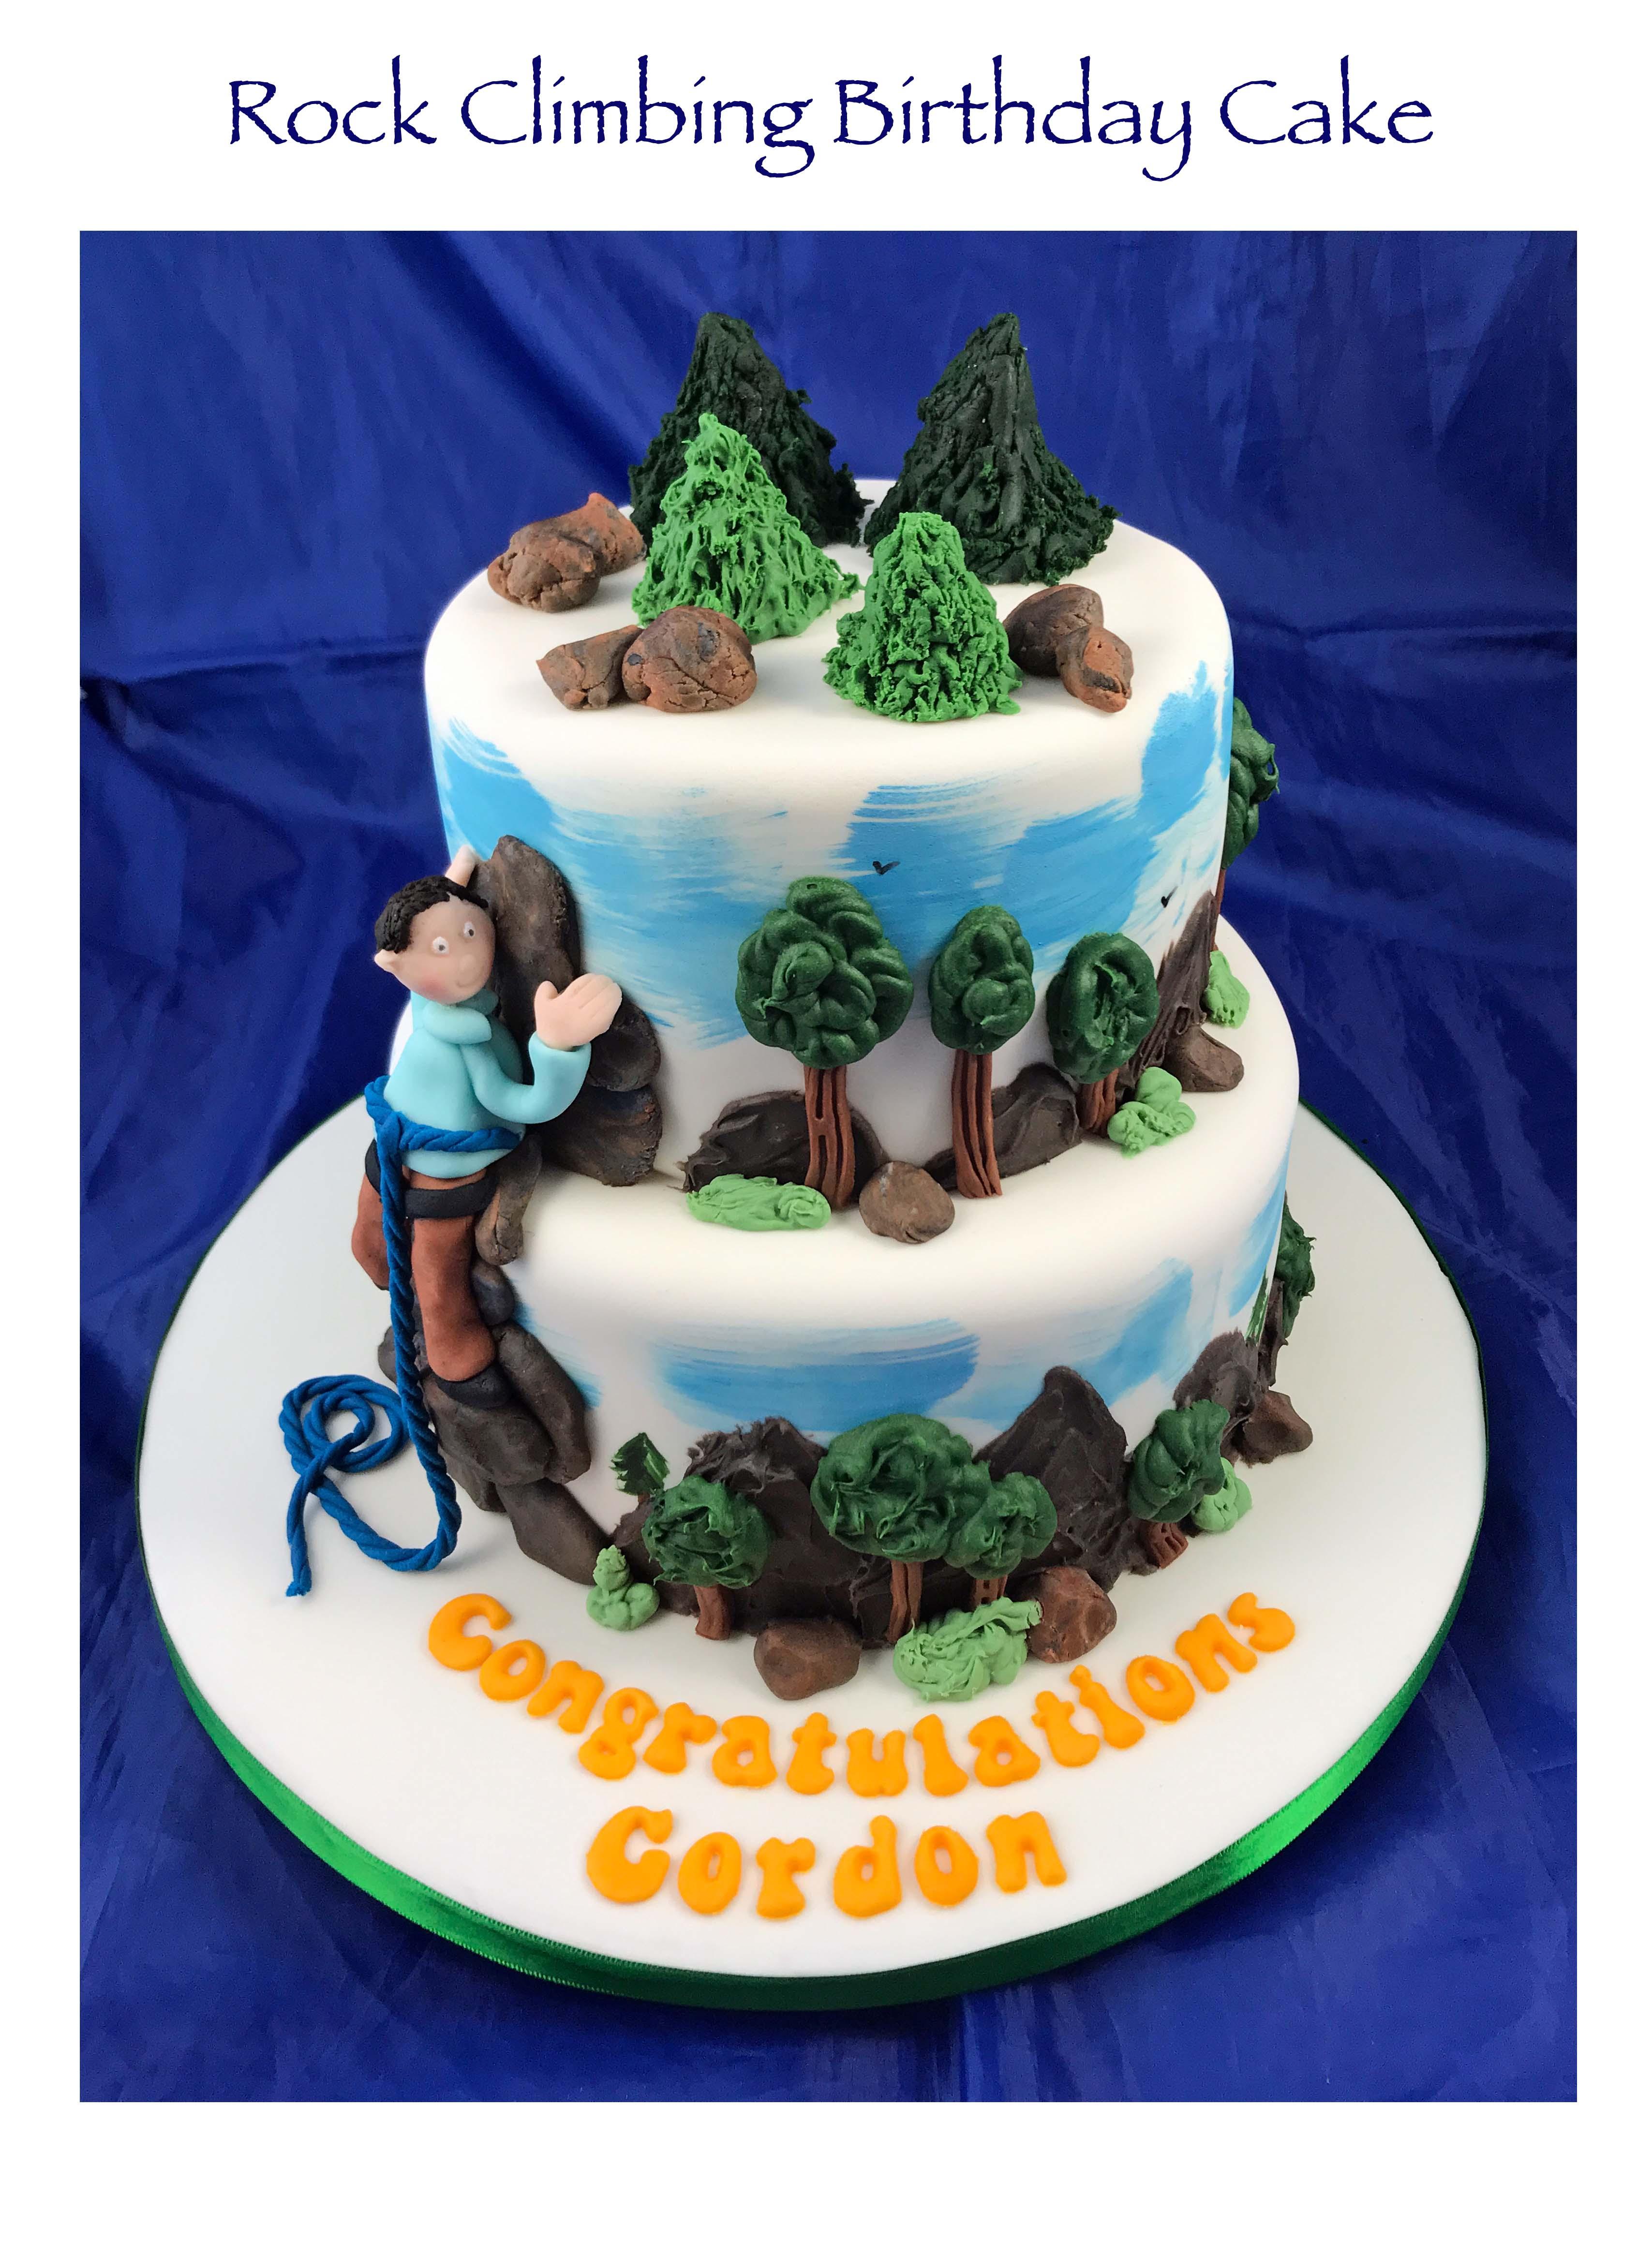 100th Rock Climbing Cake